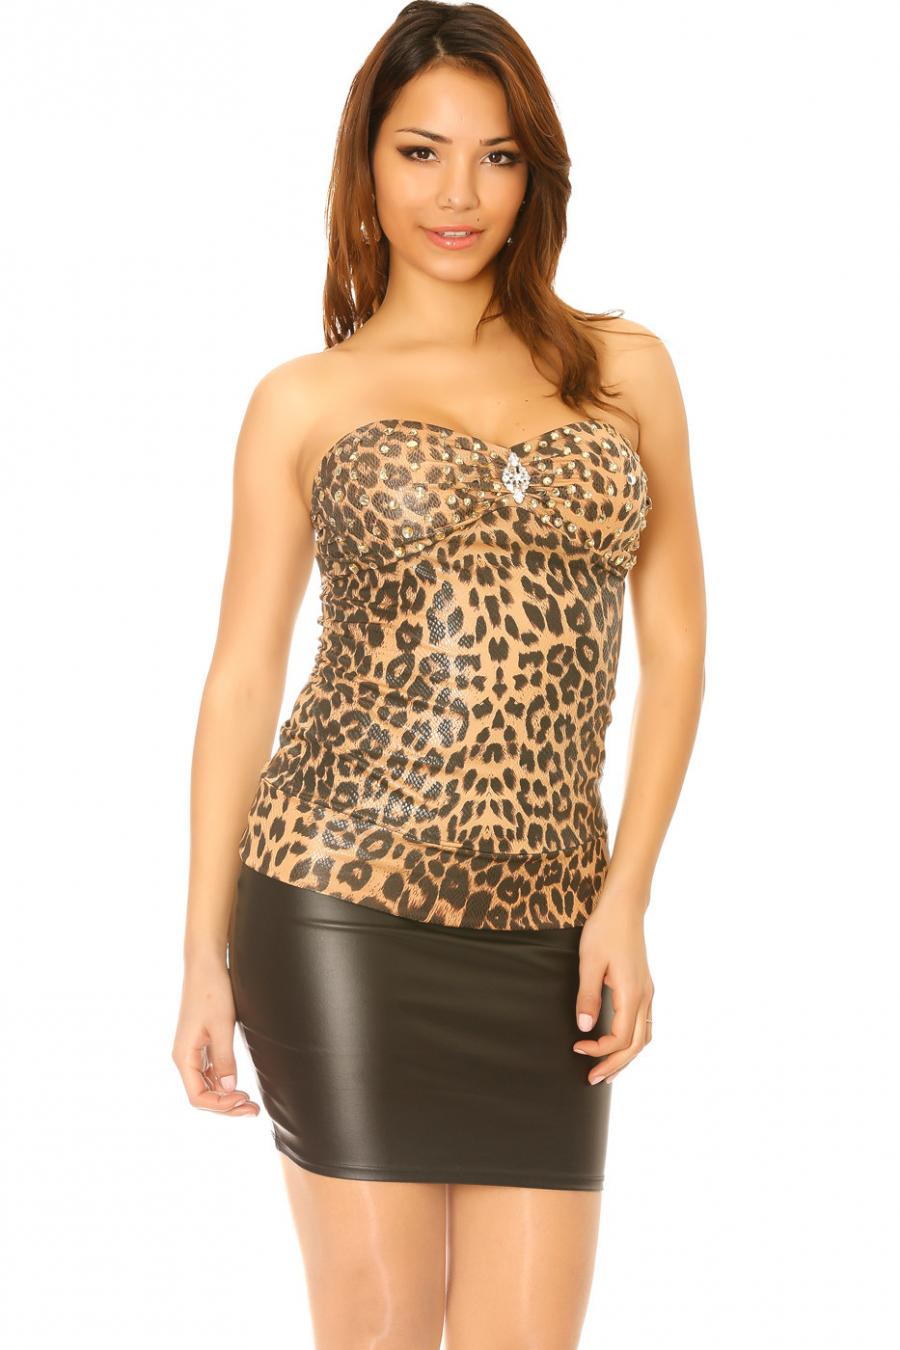 Bustier brillant en choco motif léopard avec strass au buste. Bustier 28393